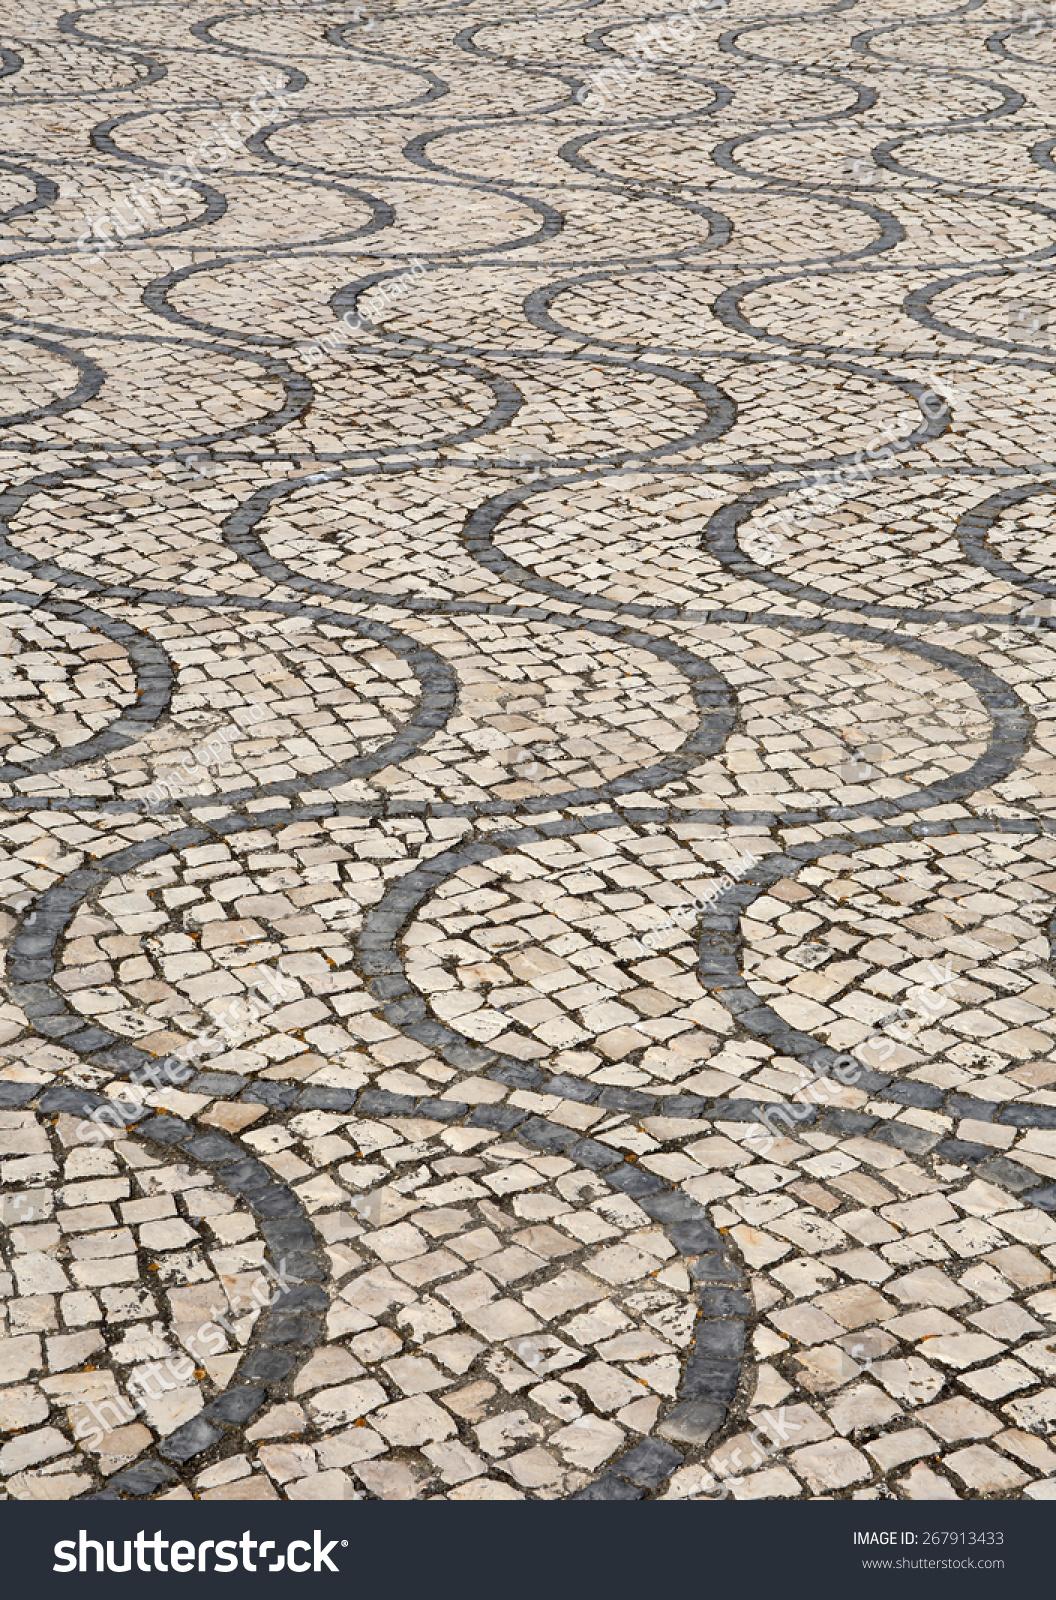 Cobble Stone Mosaics : Typical portuguese calcada mosaic cobble stone paving